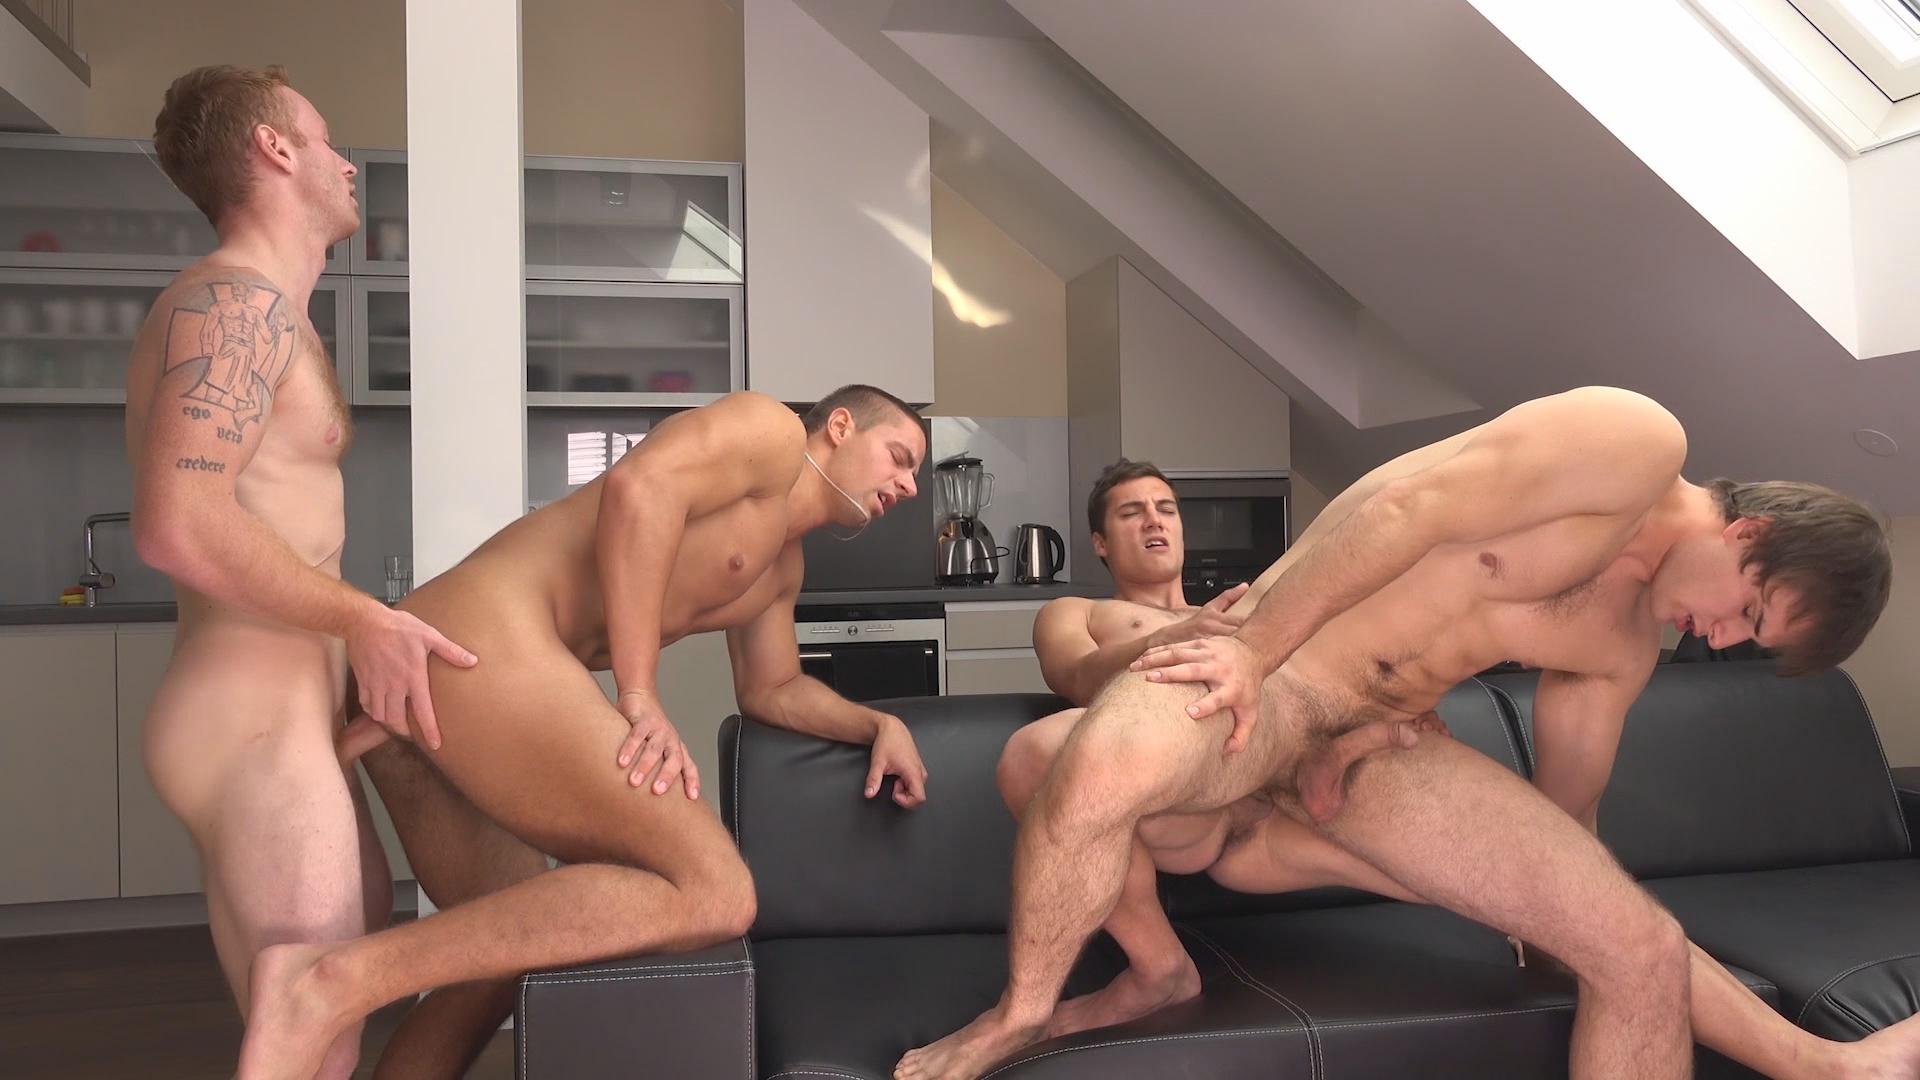 Arny Donan Orgy Gay Porn wank parties plus from prague 18 - gay - arny donan has visitors